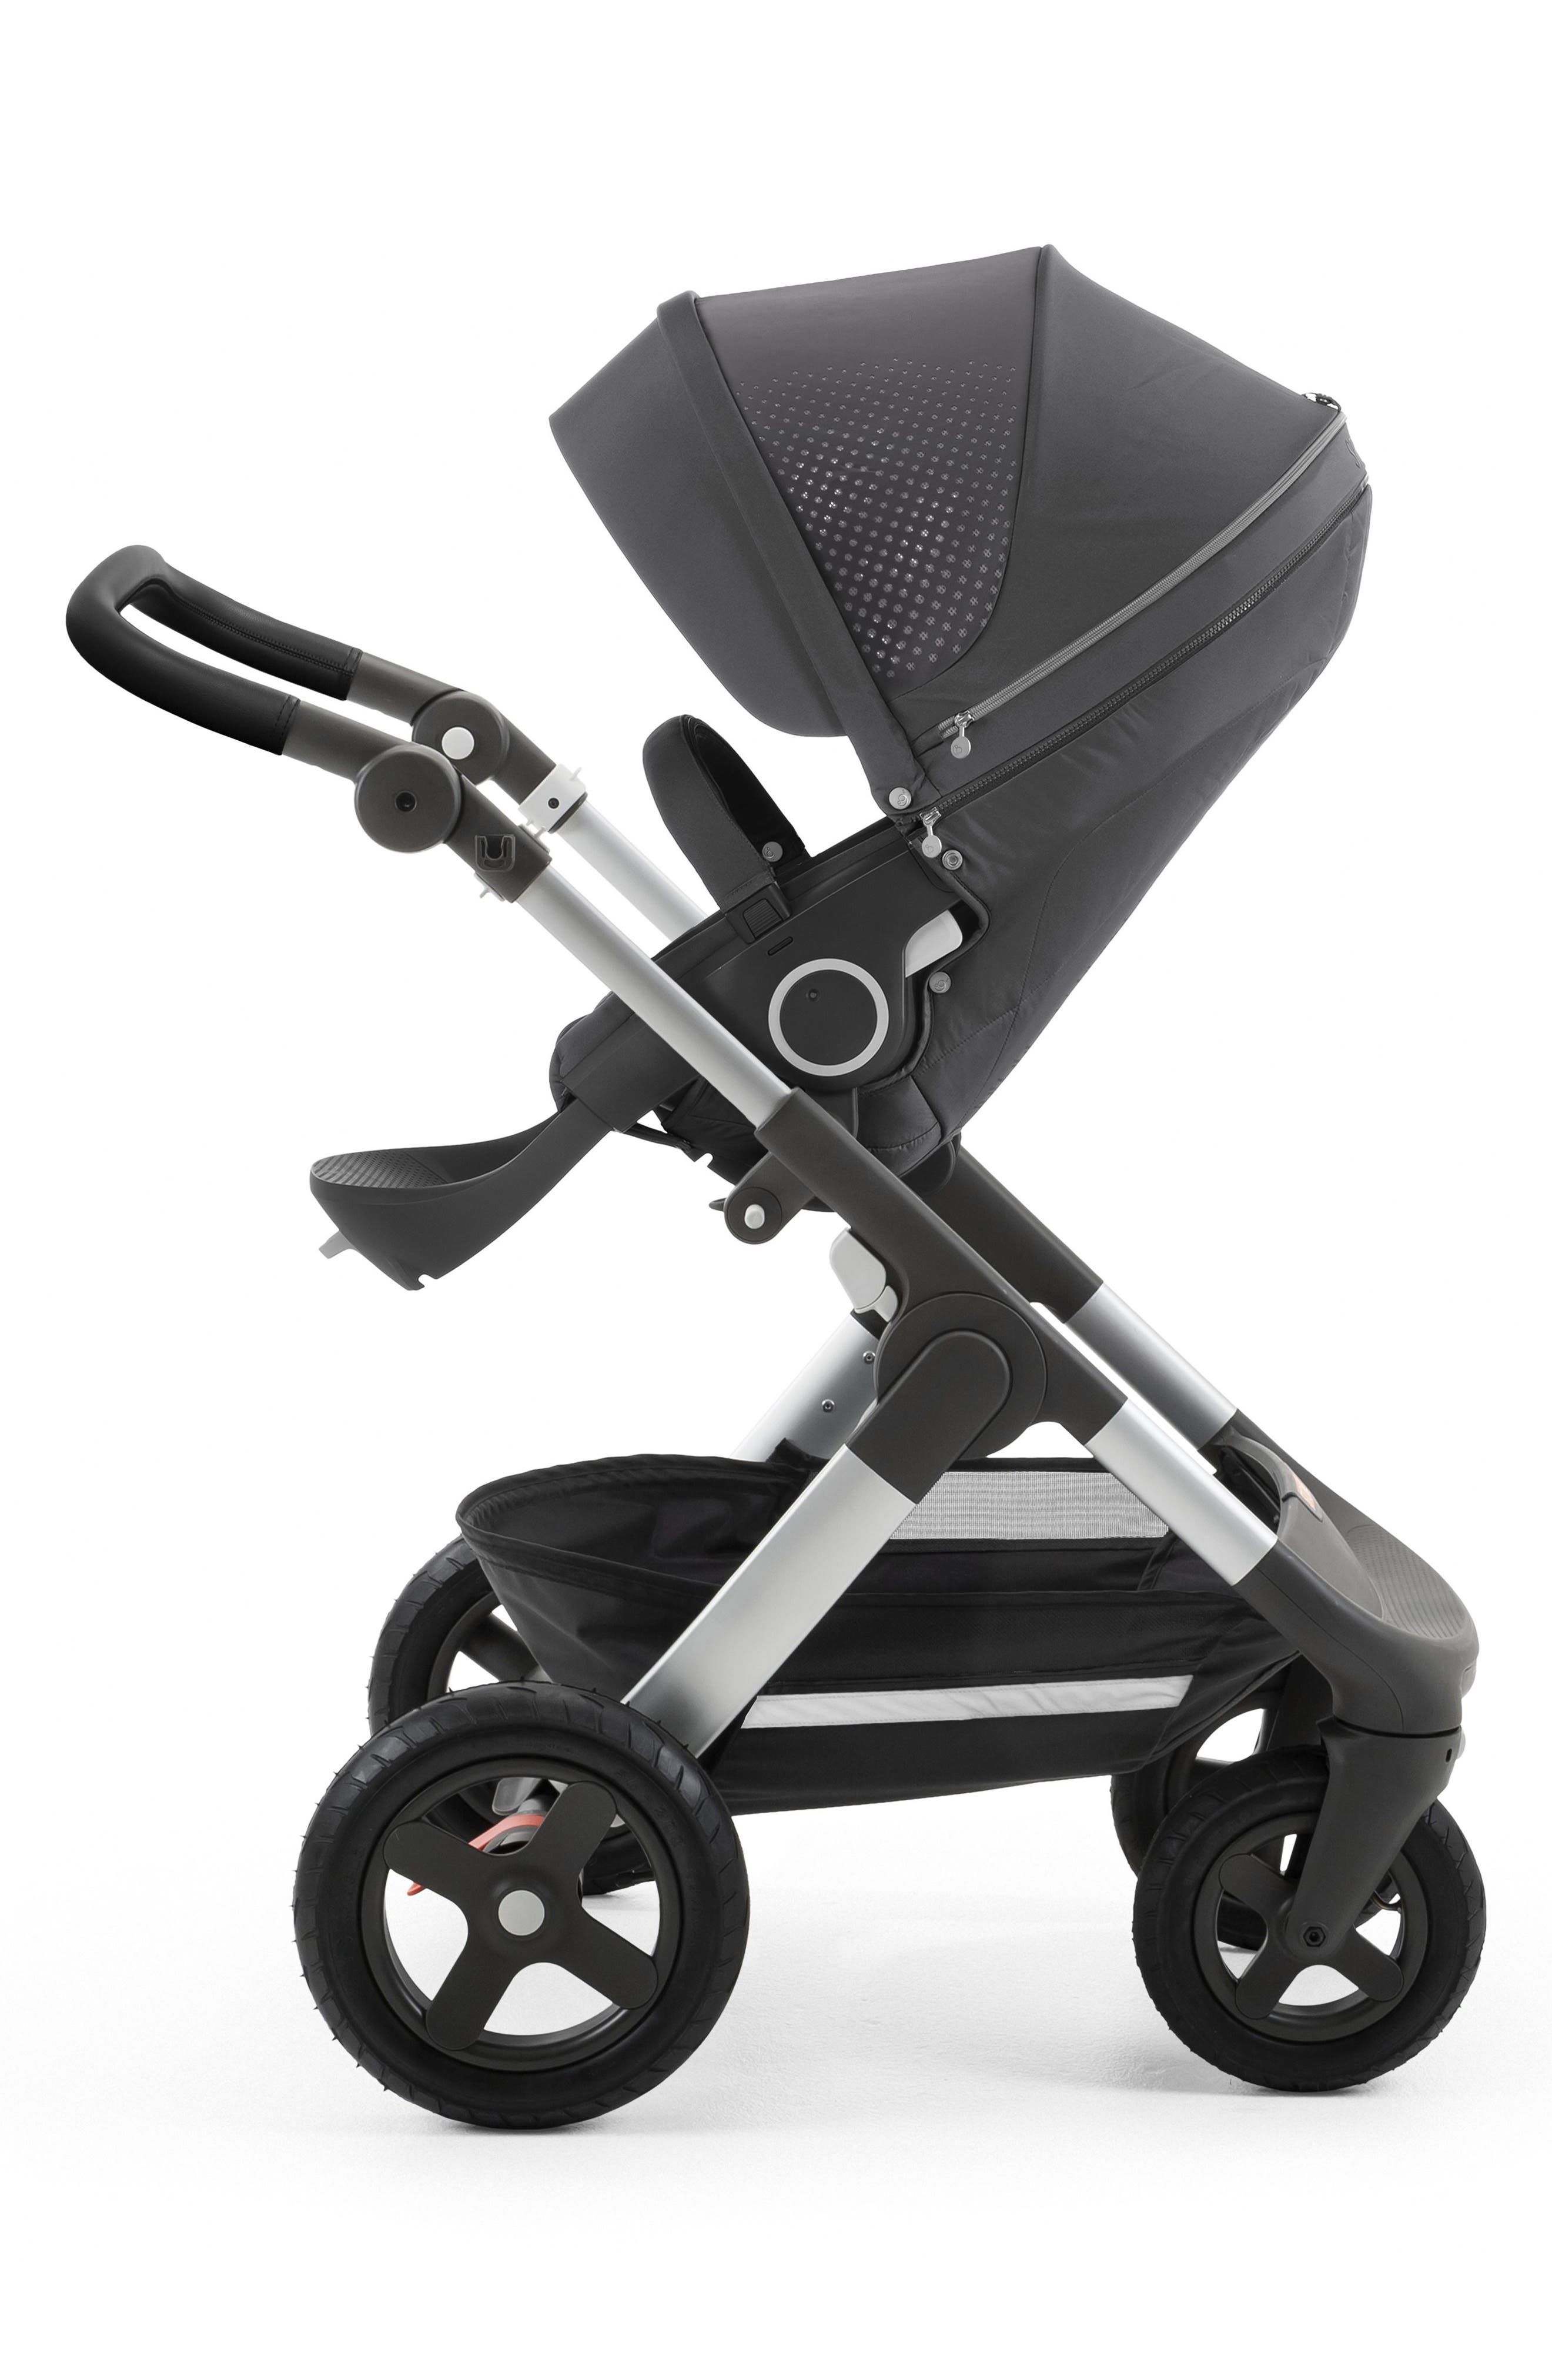 Trailz Terrain - Athleisure Limited Edition Stroller,                             Main thumbnail 1, color,                             Grey